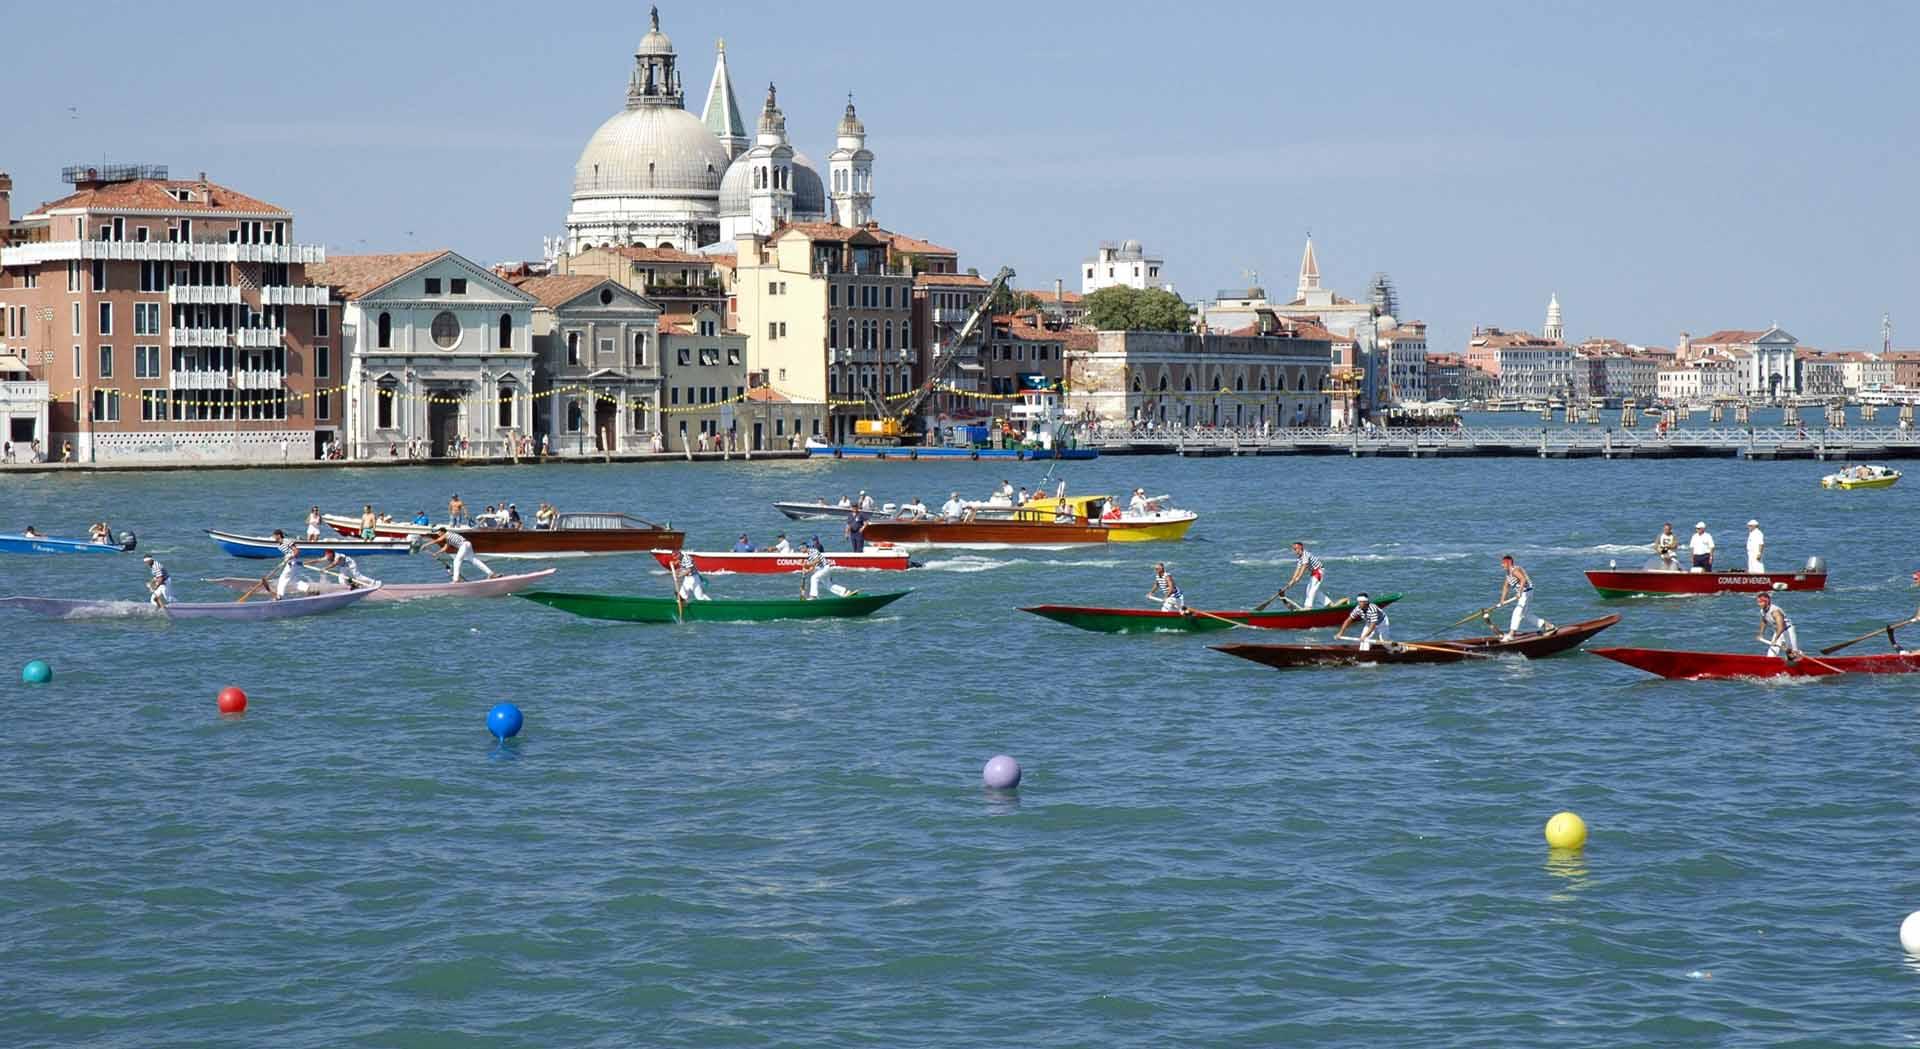 venezia, sensa, regata